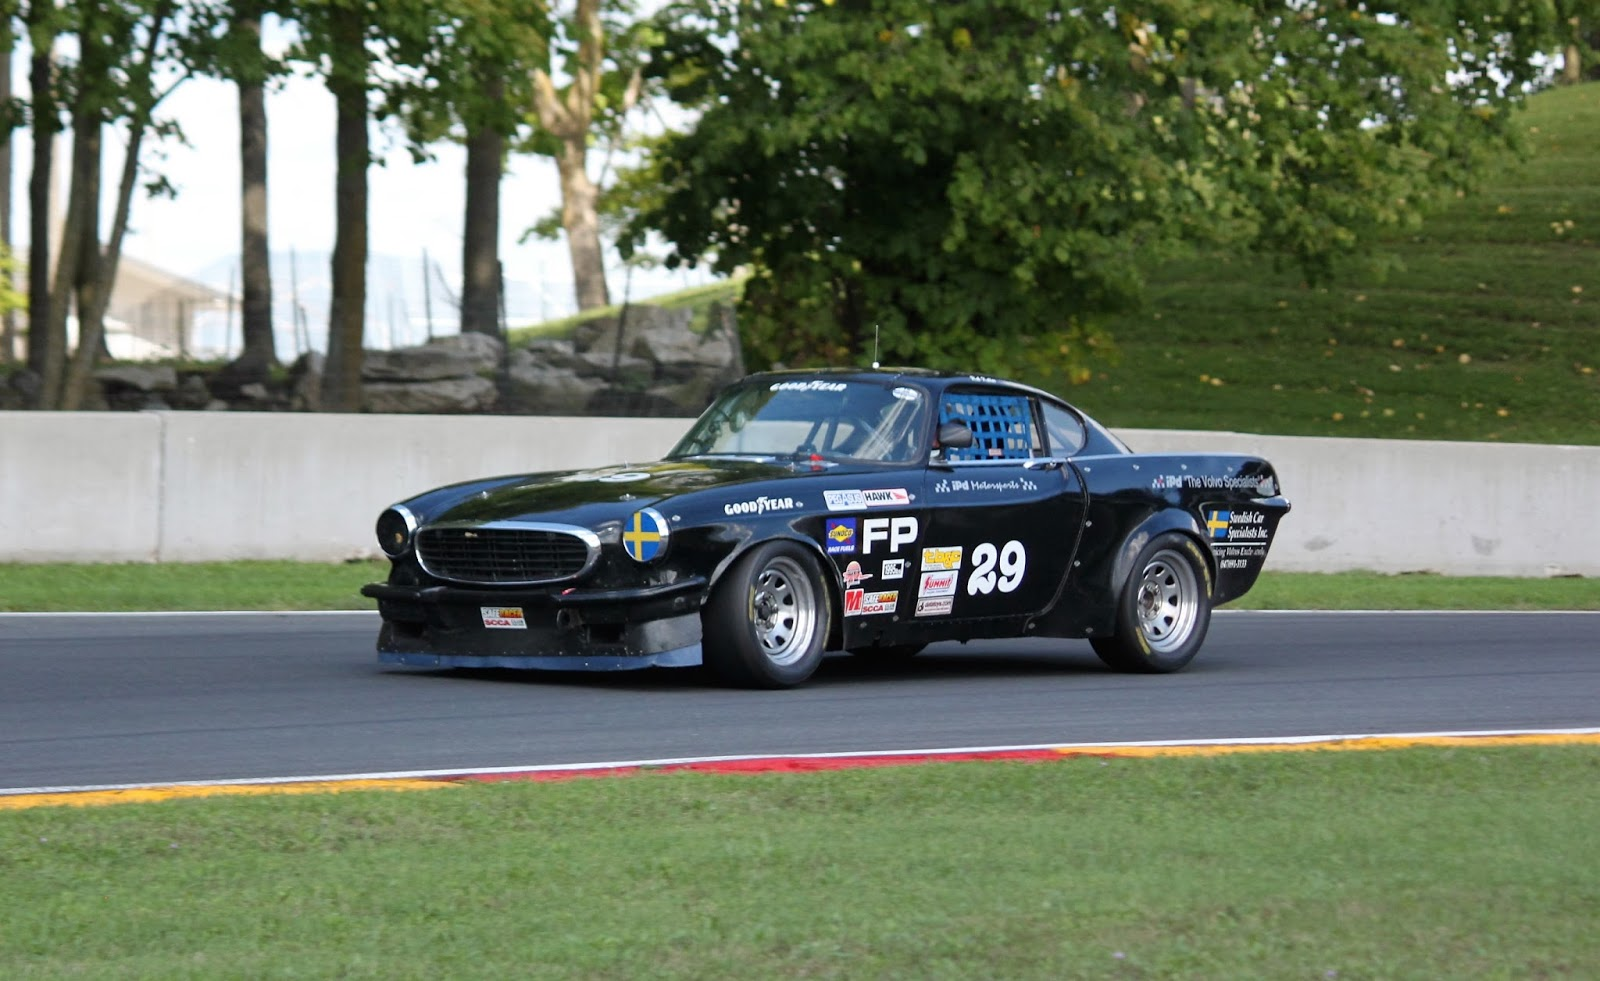 P and B Motorsports - Vintage Volvo Racing